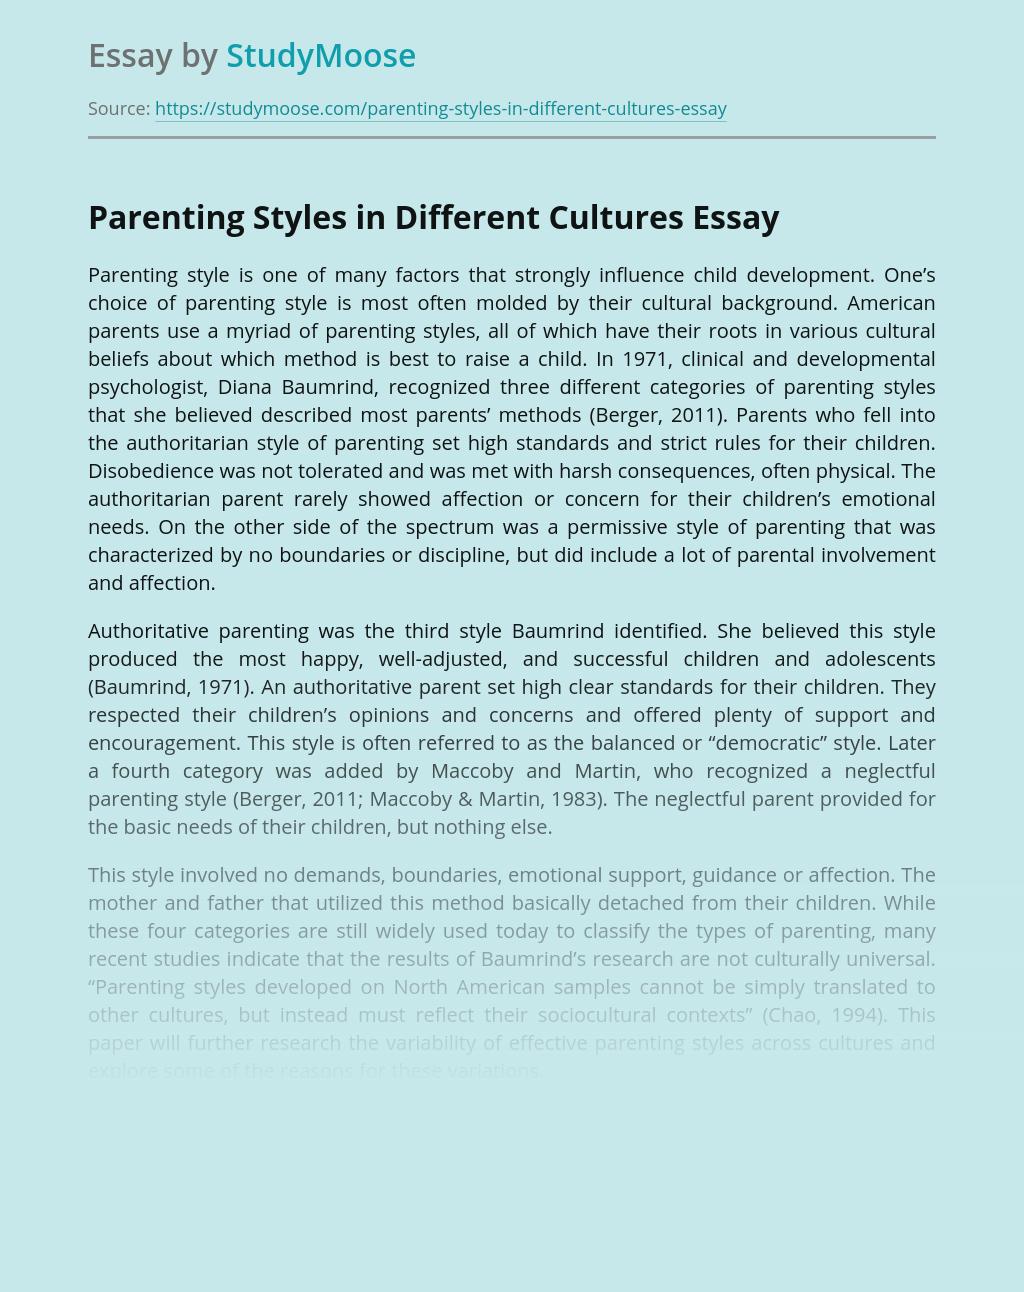 Upbringing essay article importance business plan